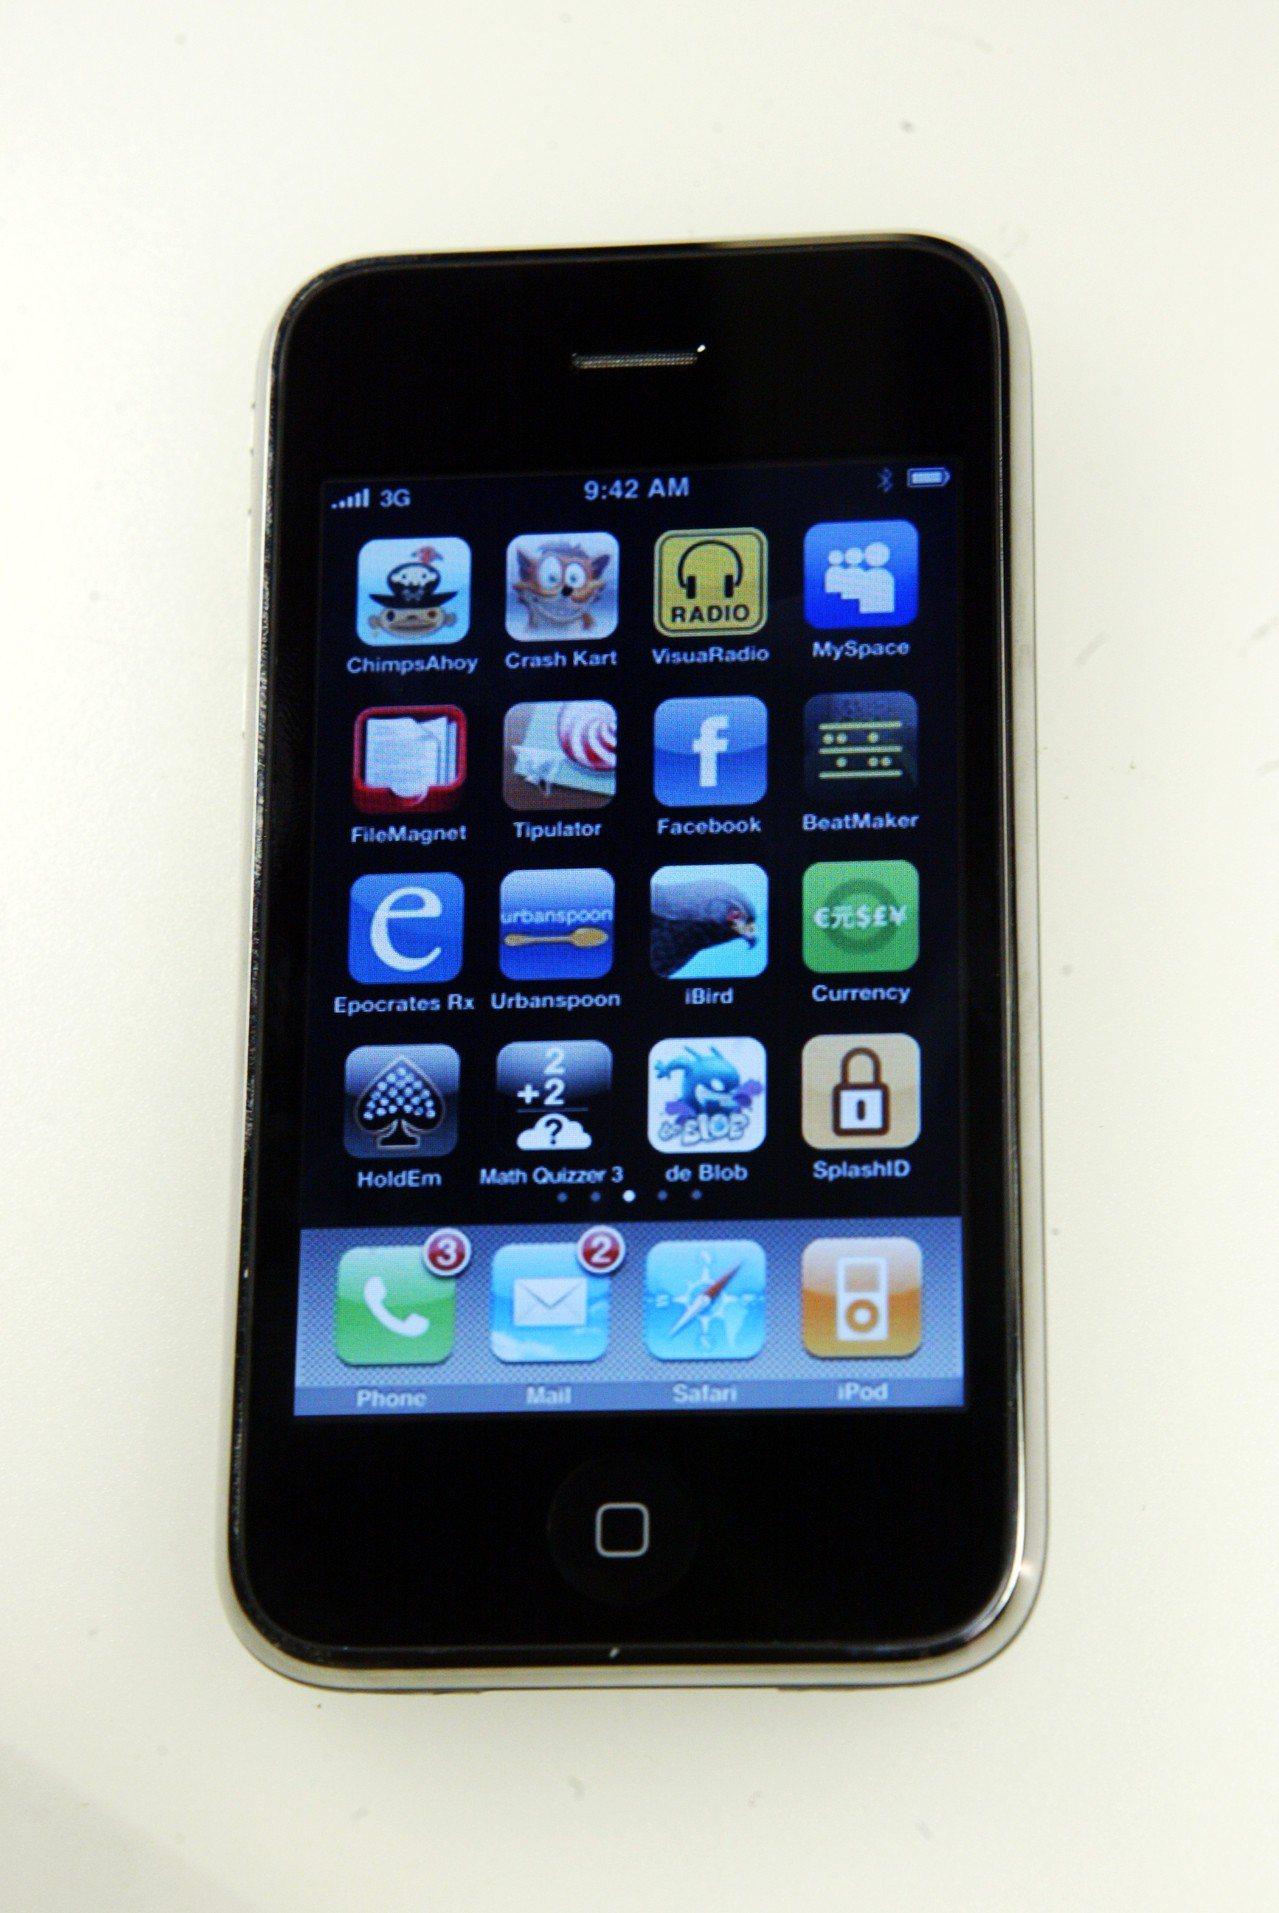 iPhone 3GS外觀照。報系資料照